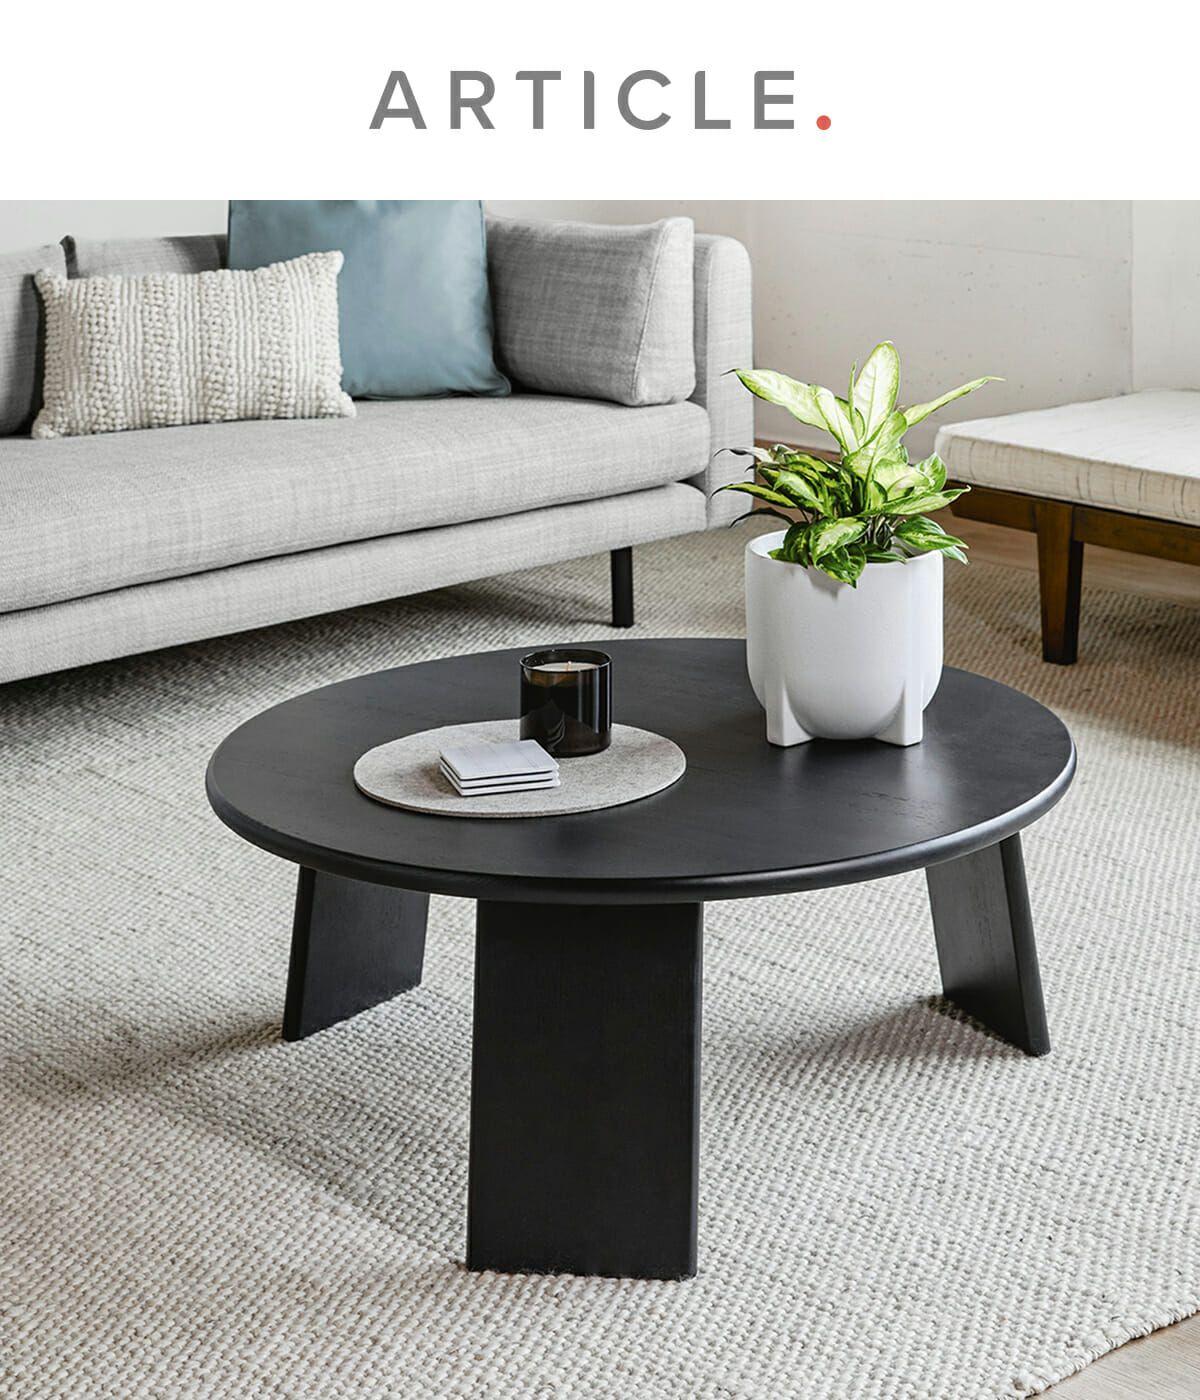 Uddo Black Ash Coffee Table Coffee Table Mid Century Modern Coffee Table Living Room Decor Furniture [ 1400 x 1200 Pixel ]